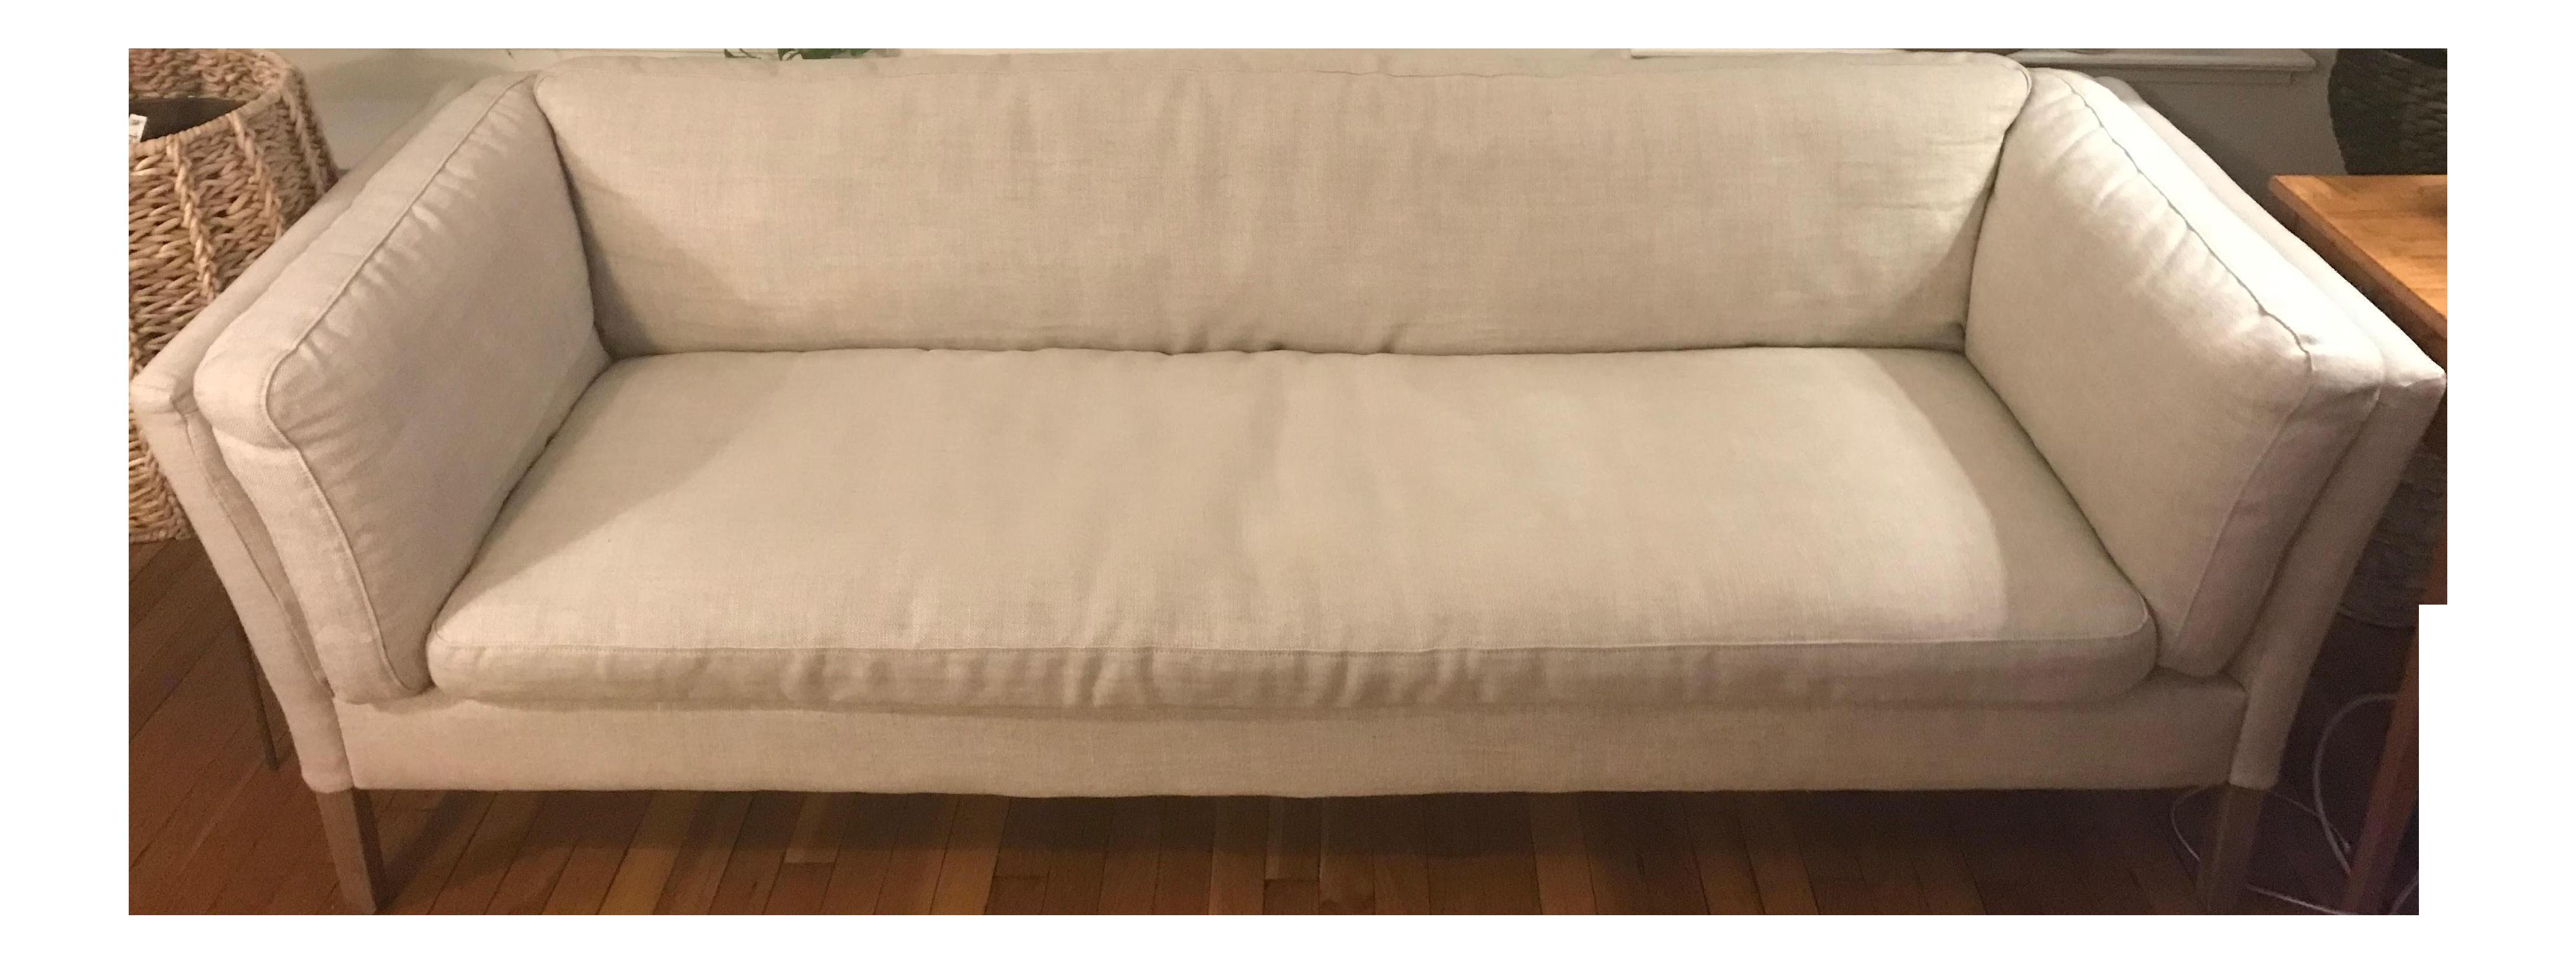 Bon Restoration Hardware Sorensen Mid Century Sofa